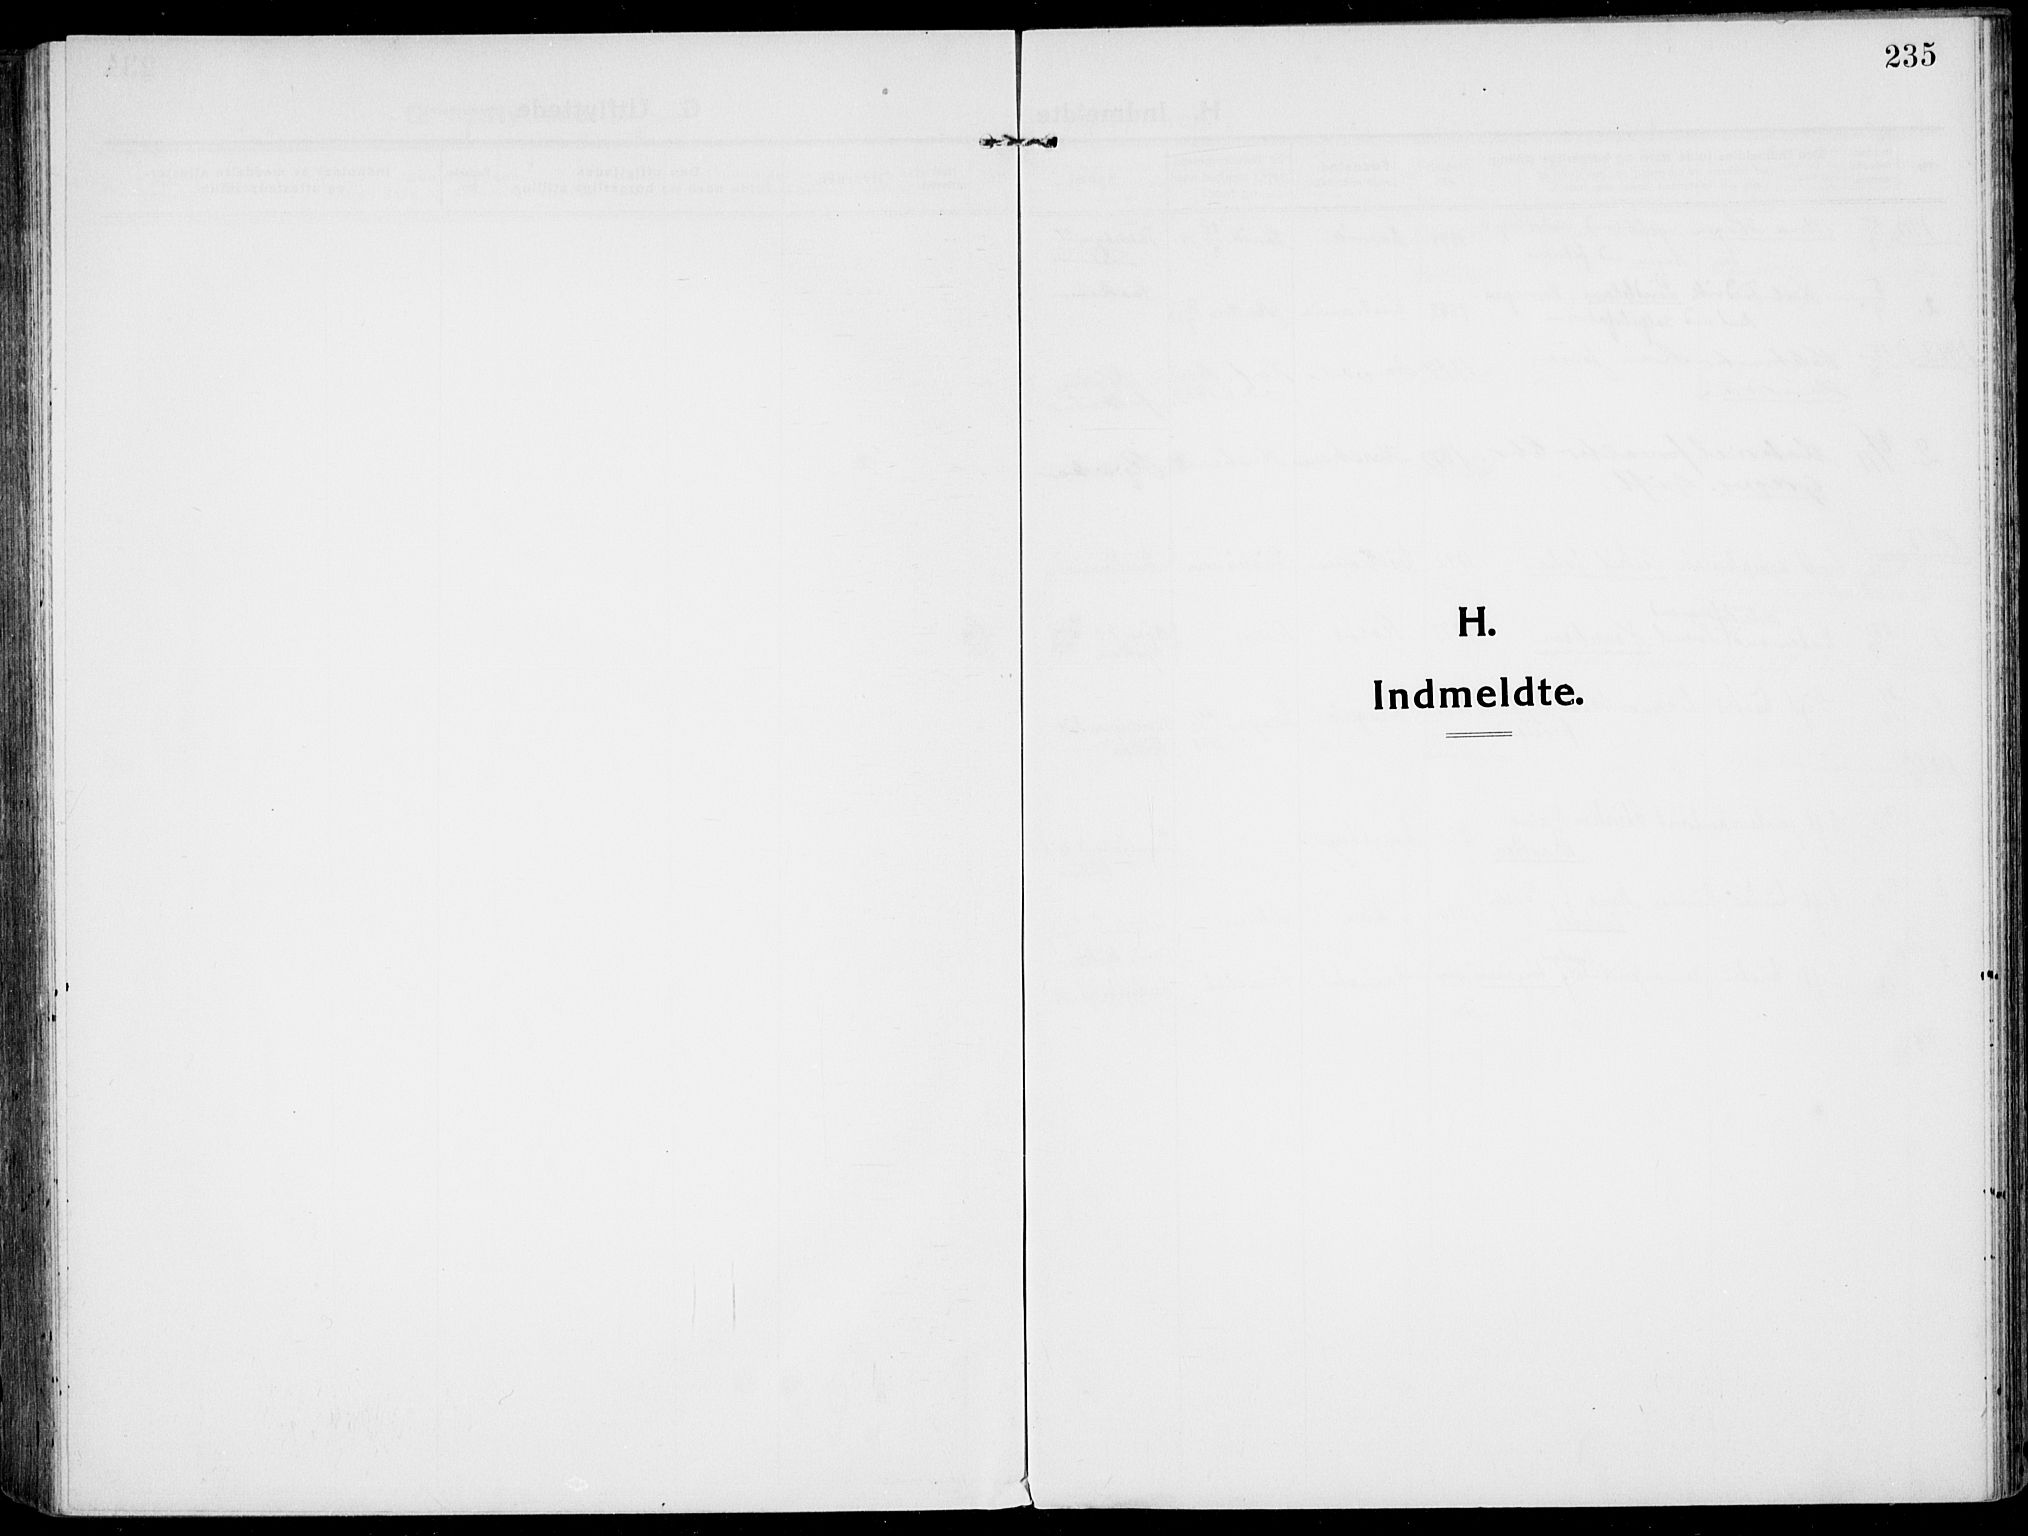 SAKO, Rjukan kirkebøker, F/Fa/L0002: Ministerialbok nr. 2, 1912-1917, s. 235